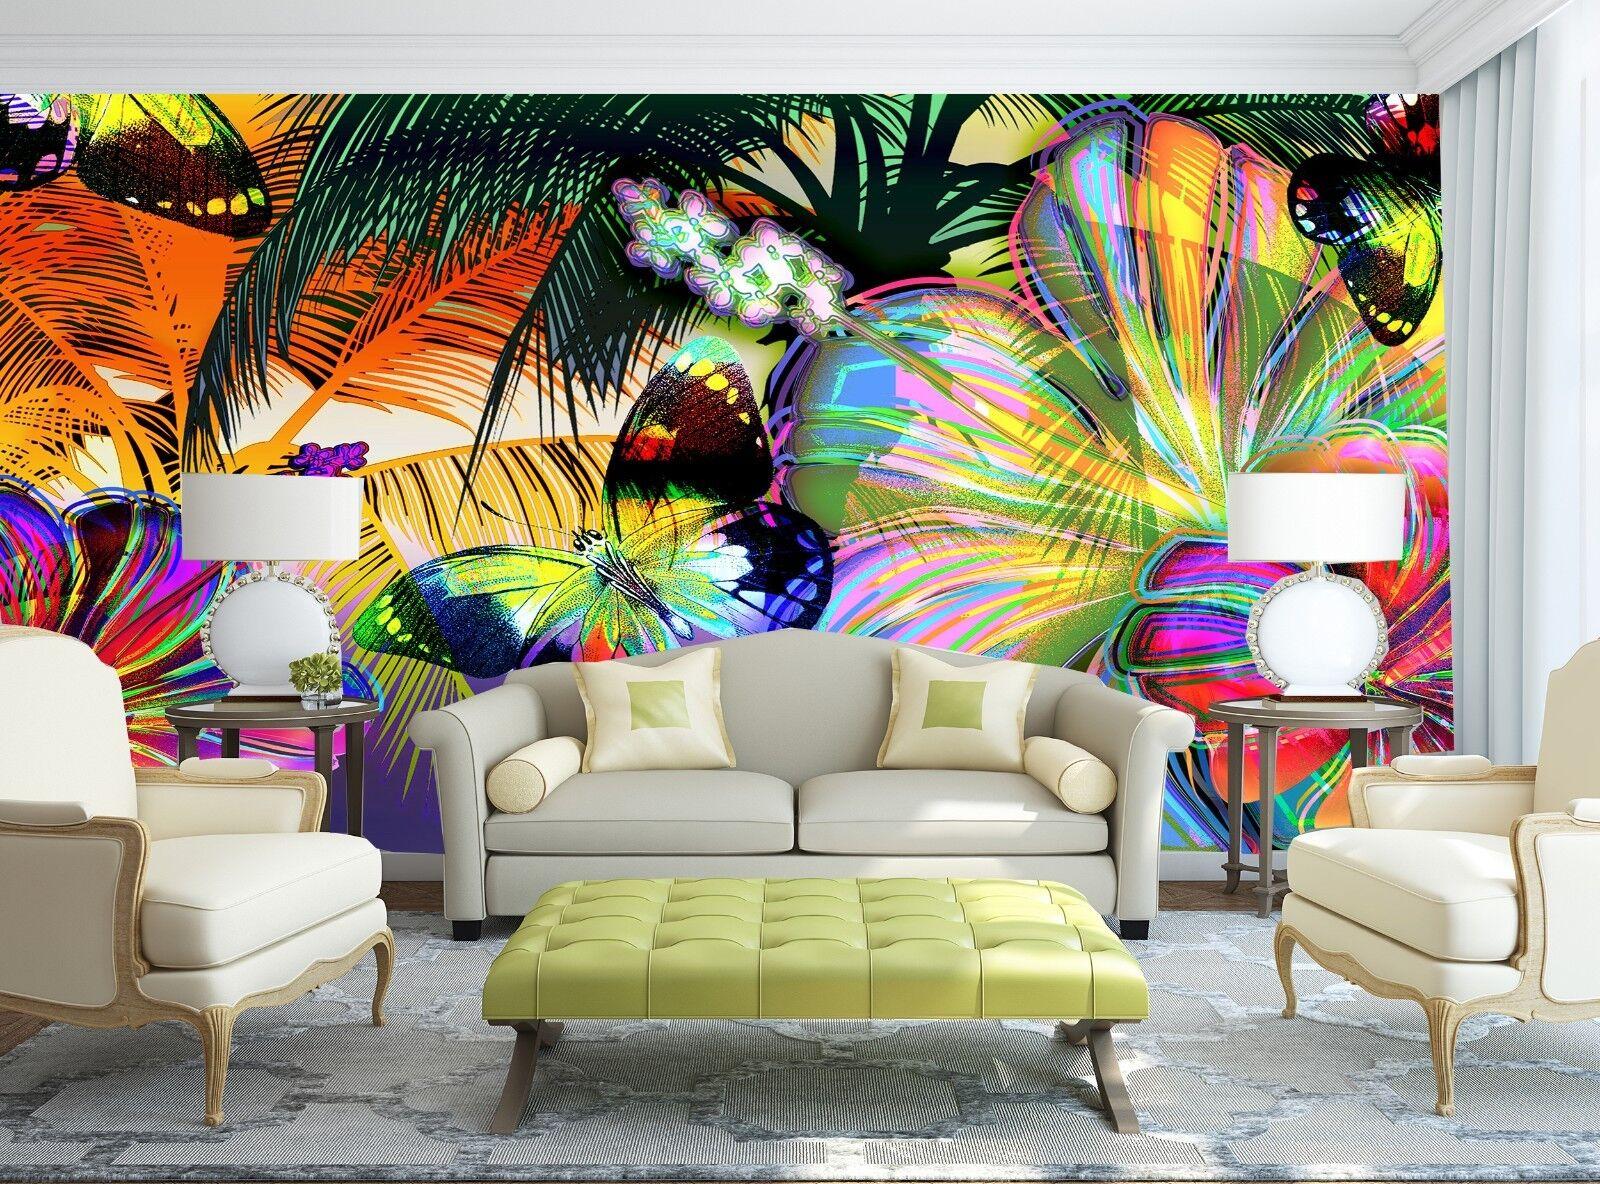 Farbeful Butterflies  Wall Mural Photo Wallpaper GIANT WALL DECOR Paper Poster